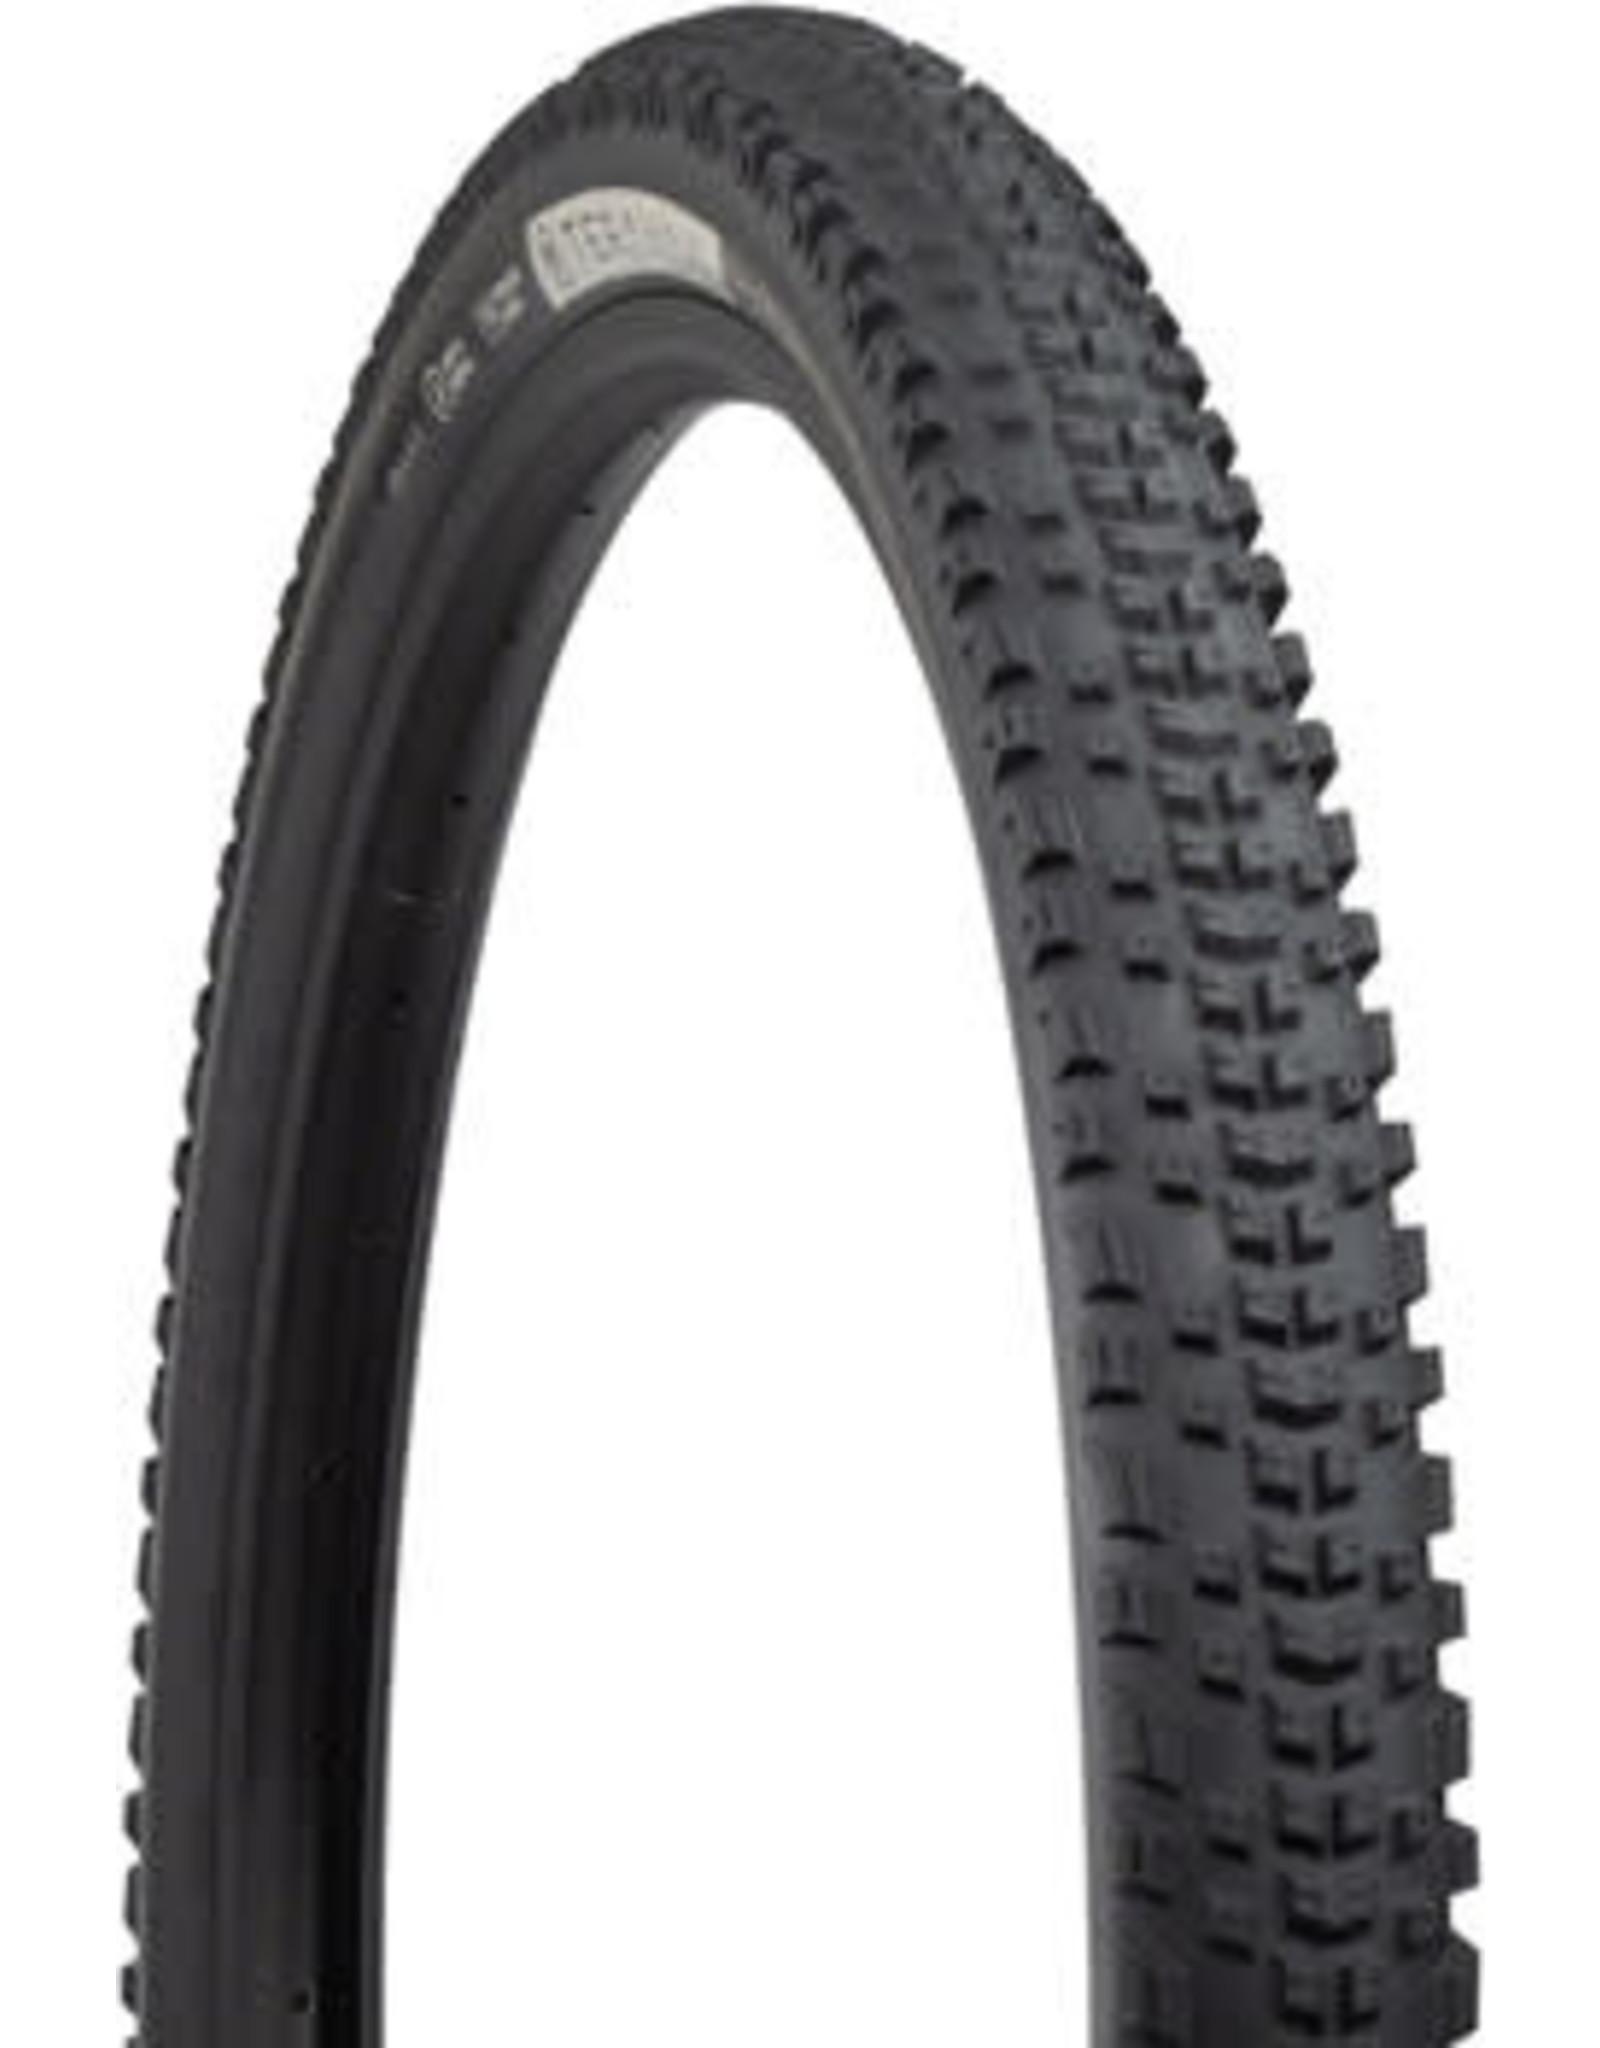 Teravail Teravail Ehline Tire - 29 x 2.3, Tubeless, Folding, Black, Light and Supple